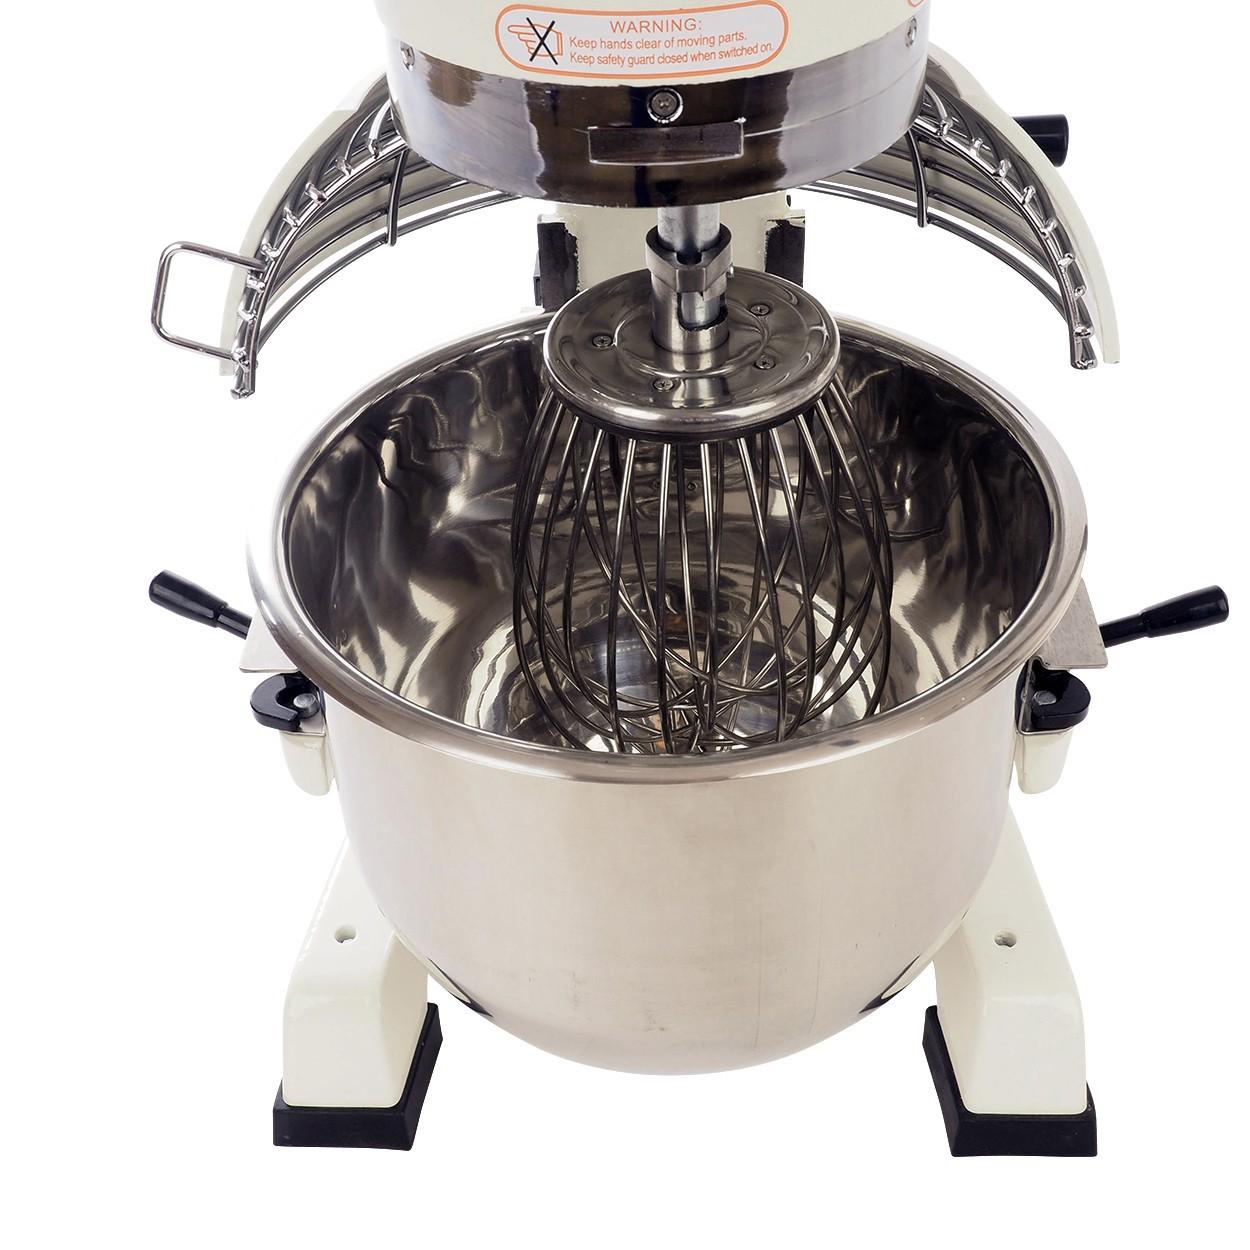 teig knetmaschine planetenr hrer teigkneter 30 liter 1500 watt ebay. Black Bedroom Furniture Sets. Home Design Ideas